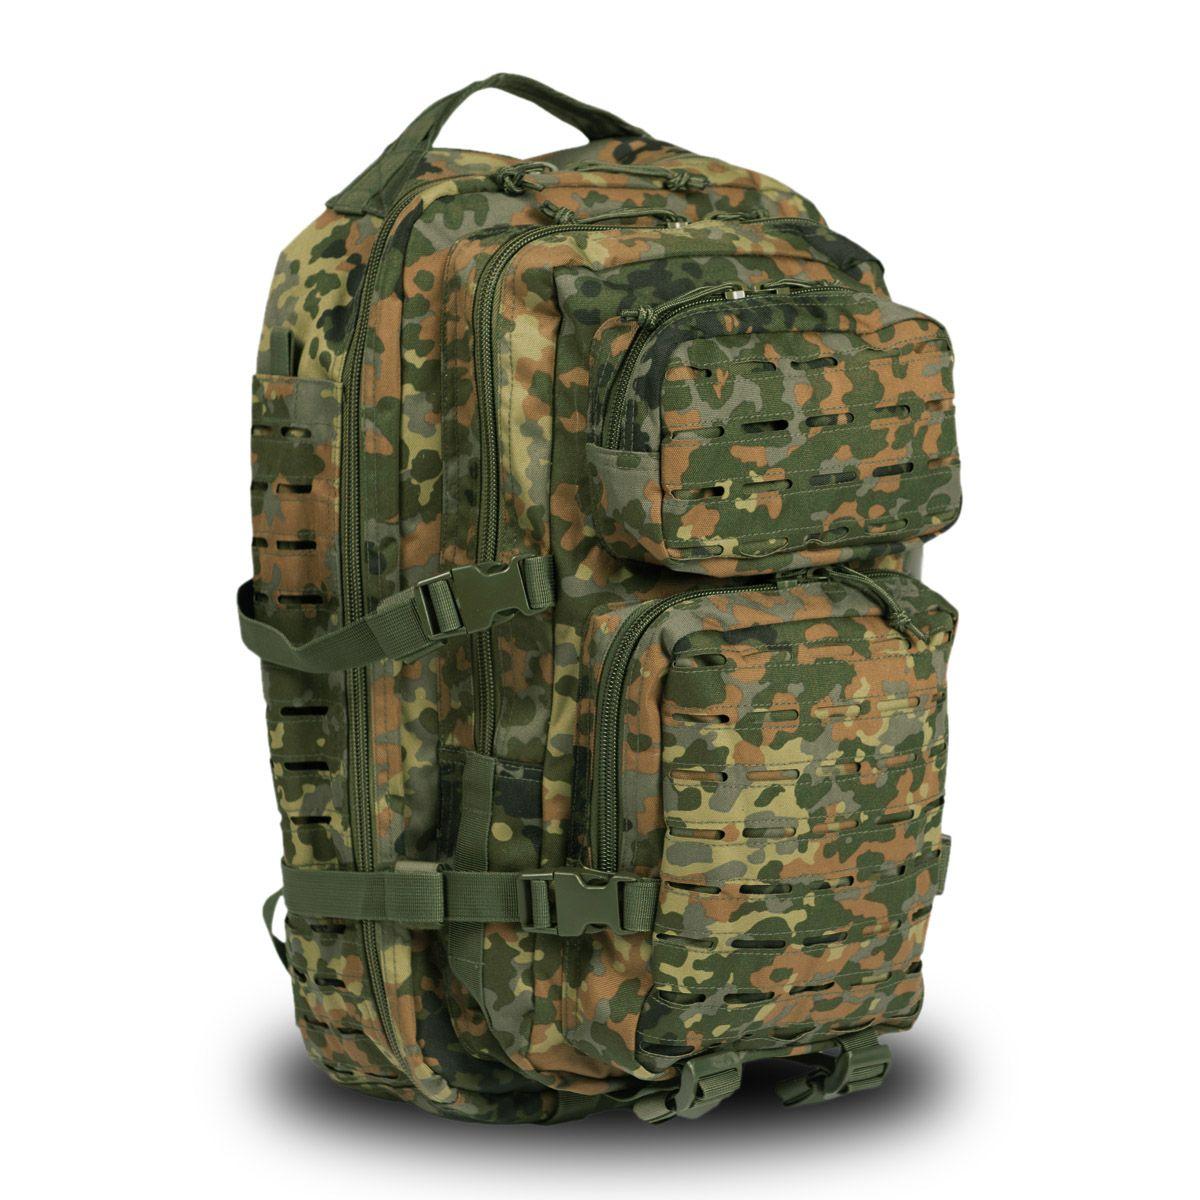 MANDRA Night Camo MOLLE RUCKSACK Assault Large Bag 36L BACKPACK Tactical Pack